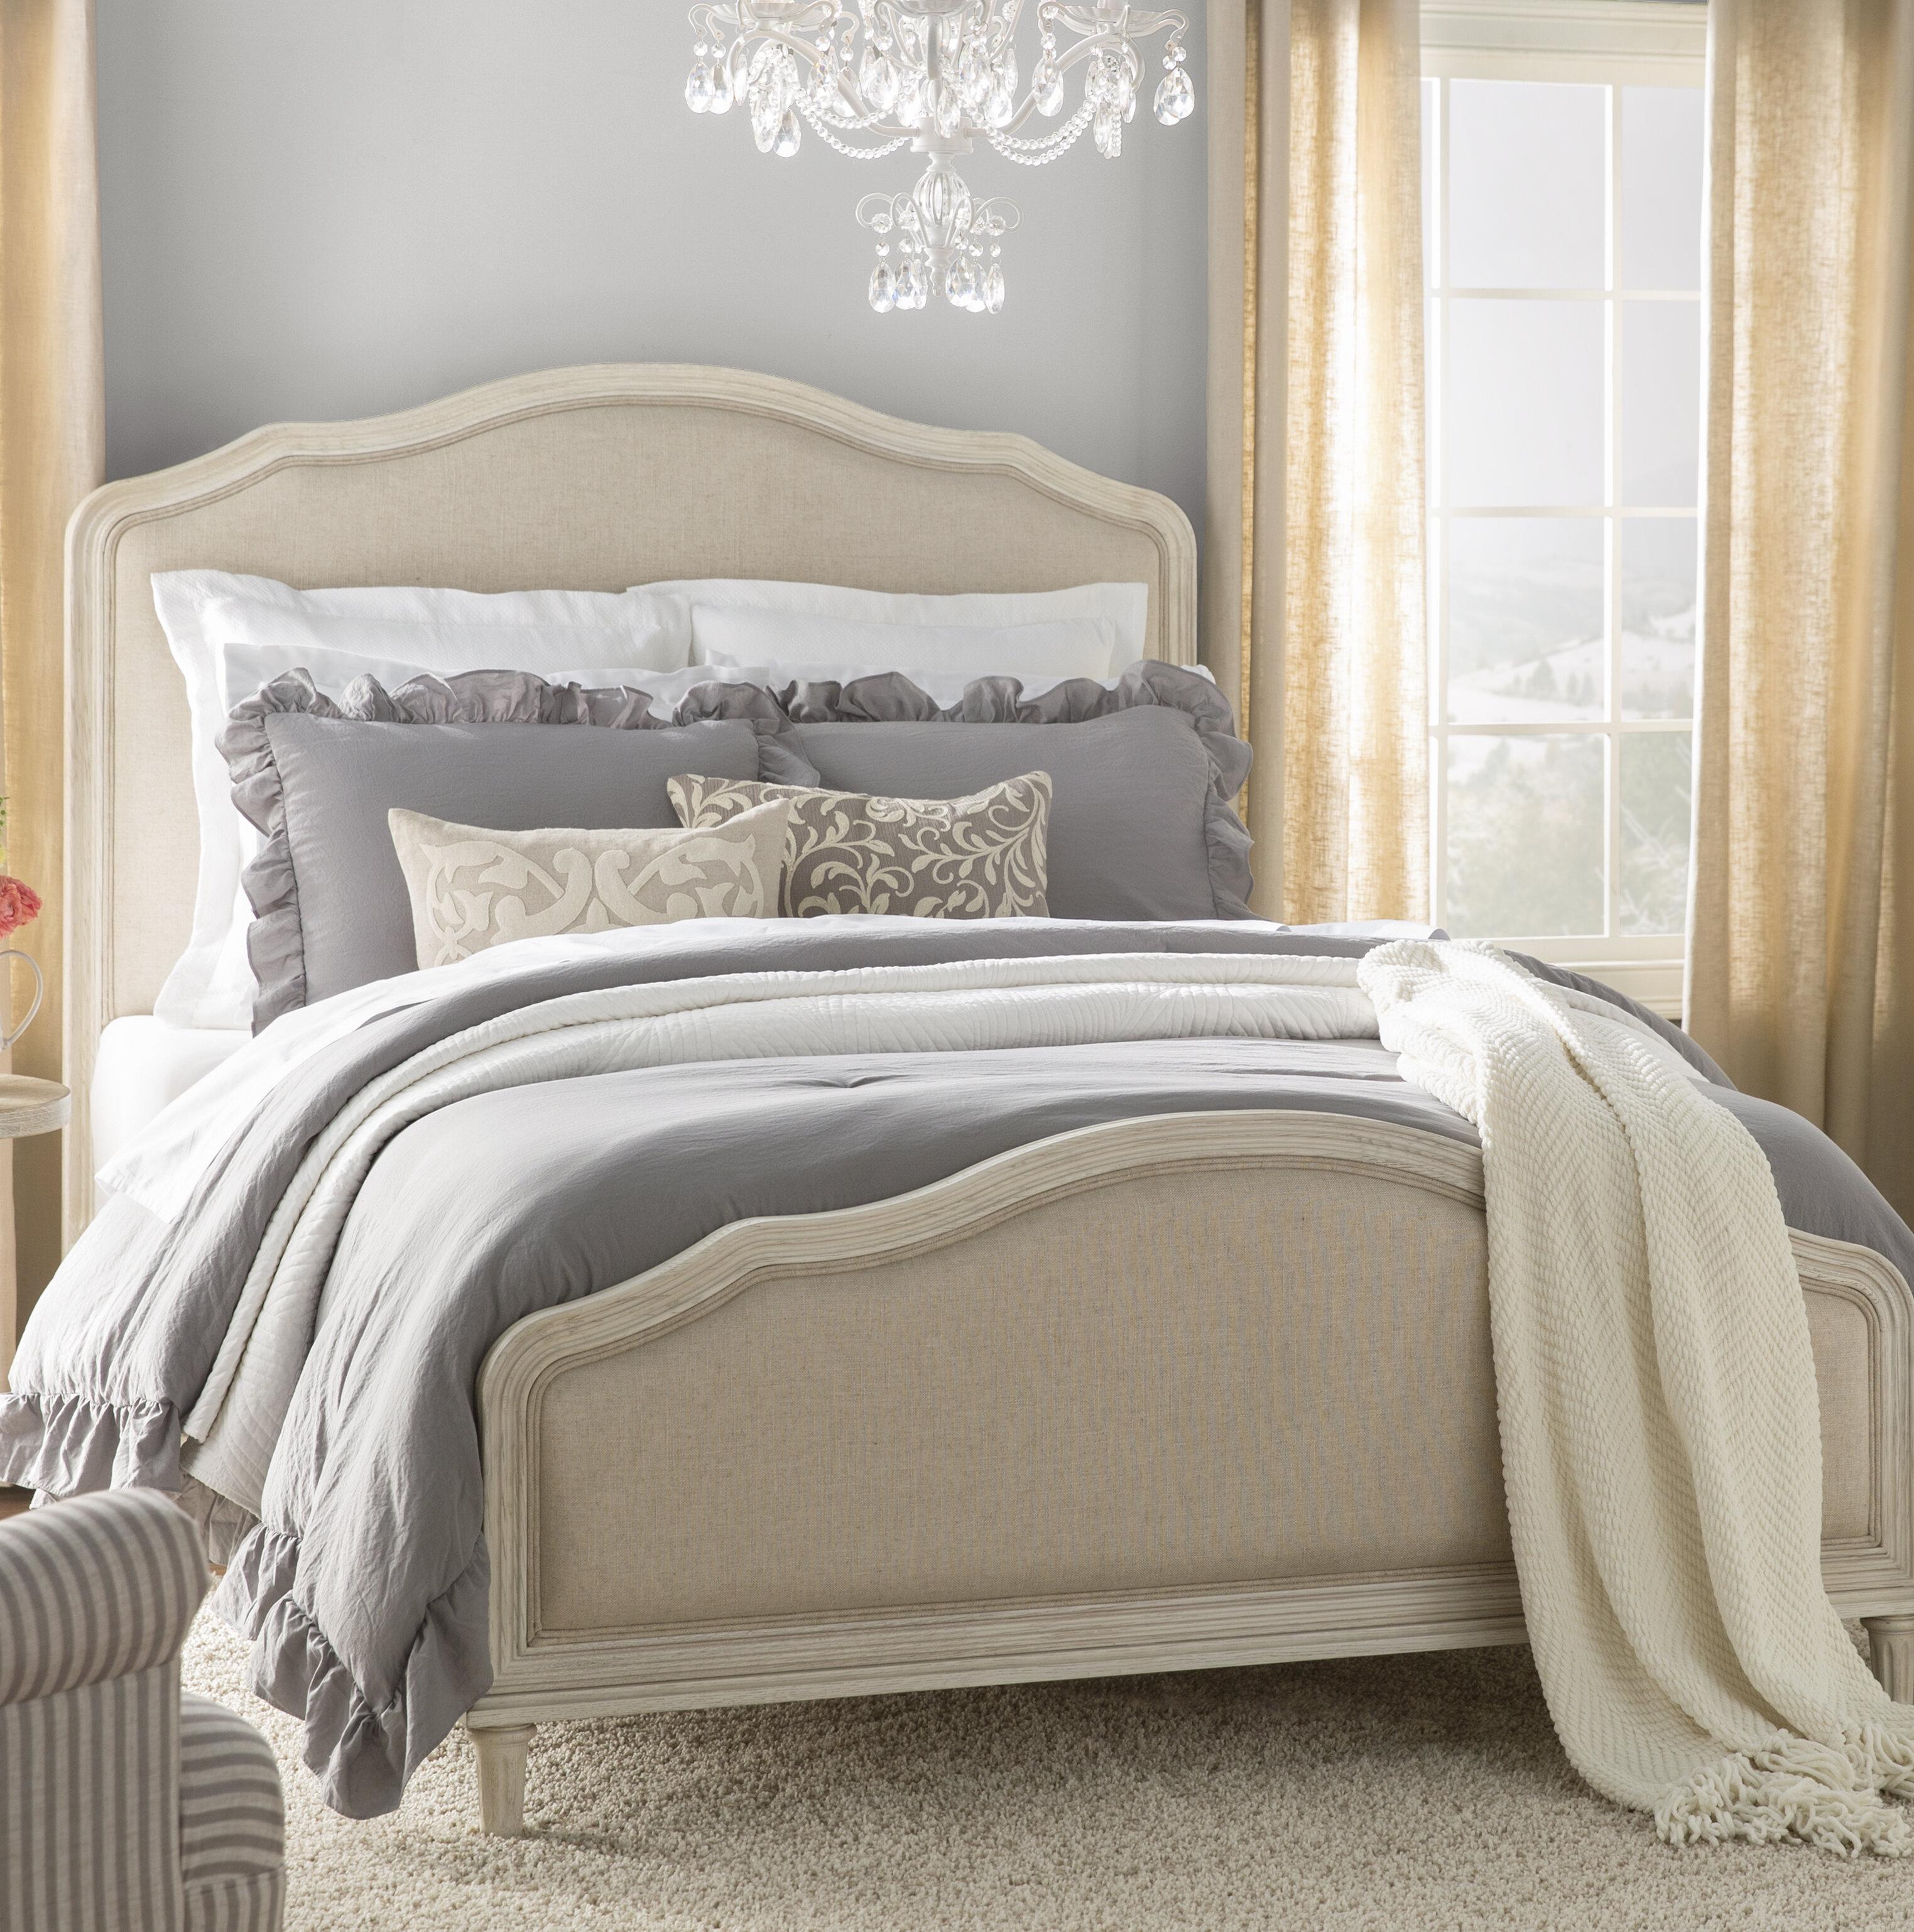 Romaine Upholstered Standard Bed Reviews Joss Main